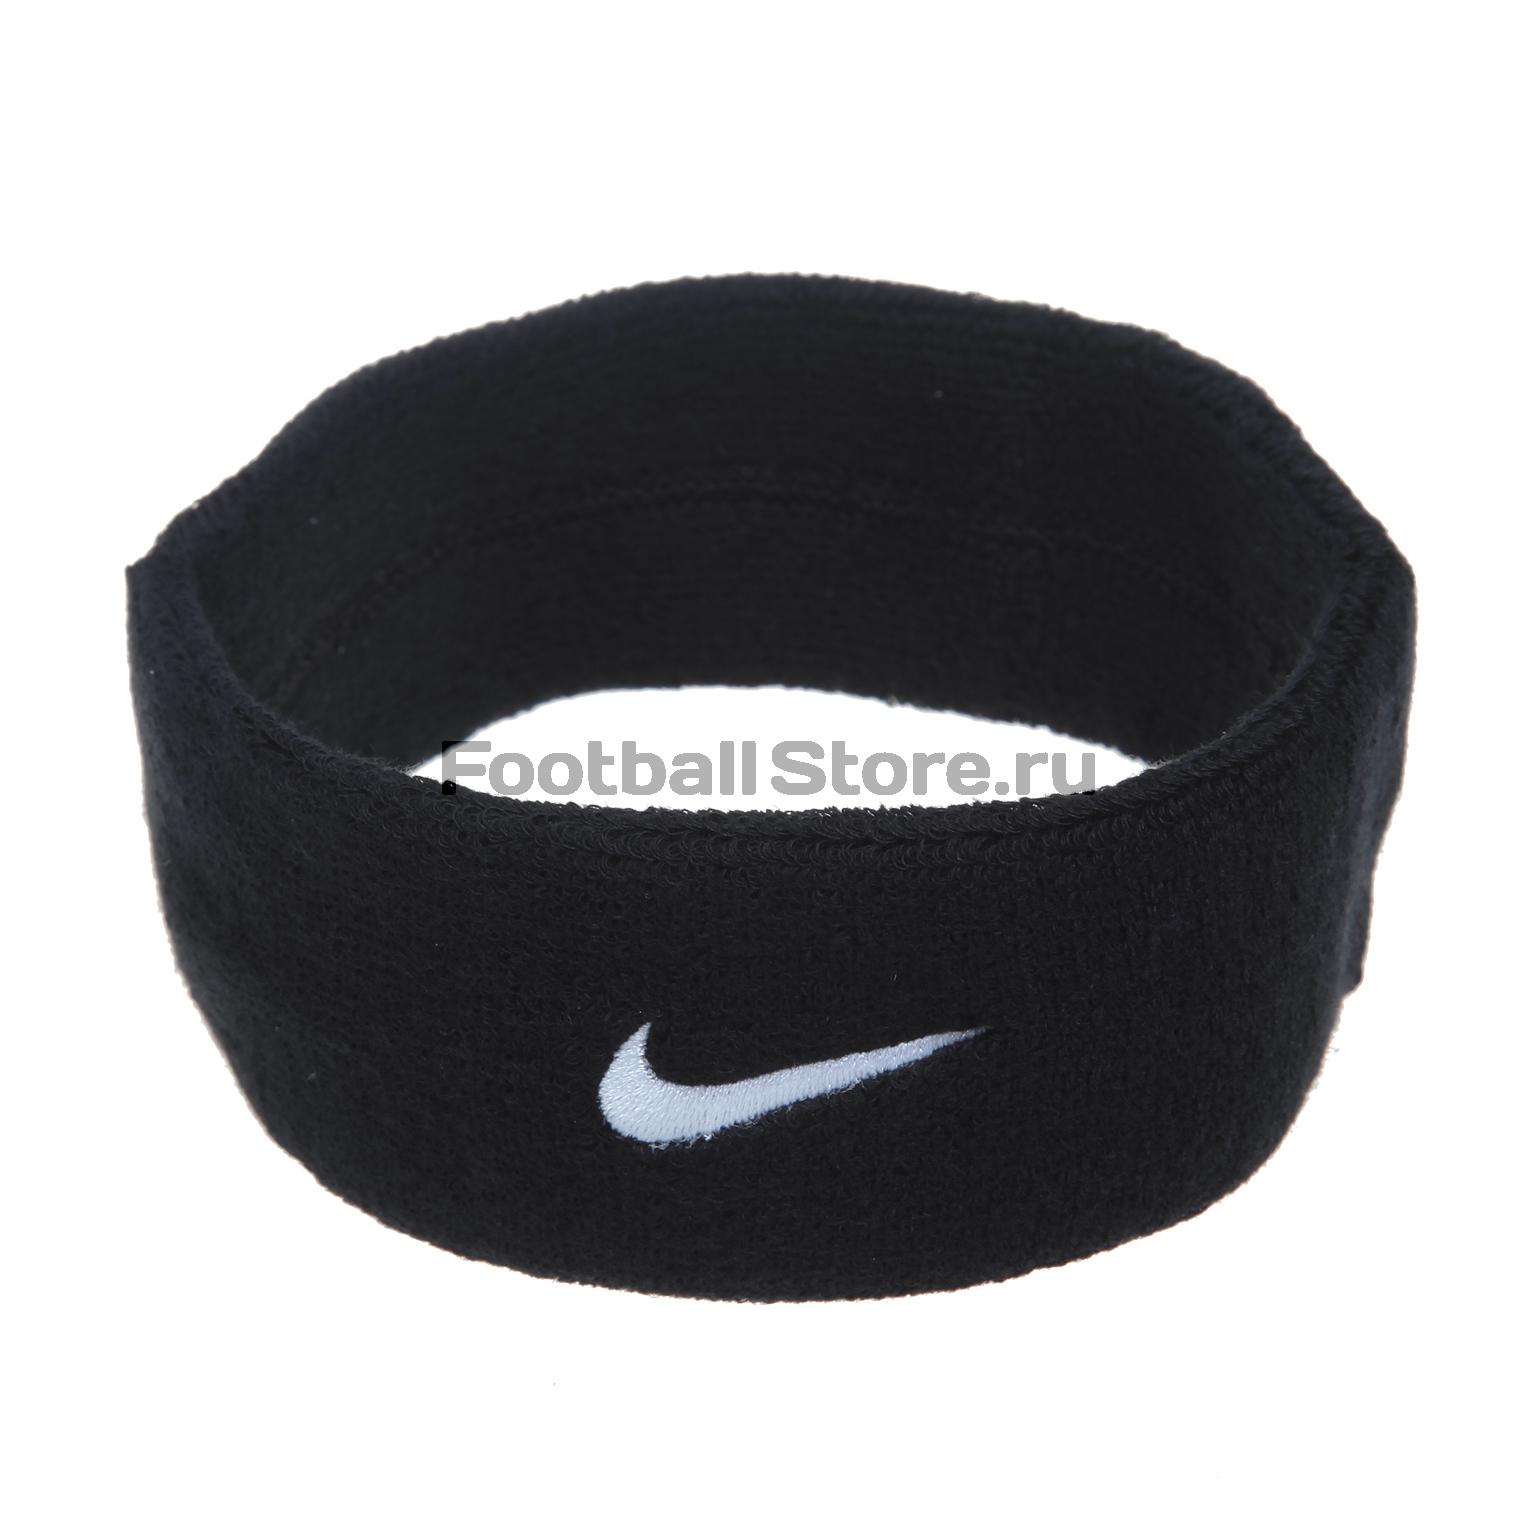 Повязка на голову Nike Swoosh Headband N.NN.07.010.OS повязки на голову lak miss повязка на голову